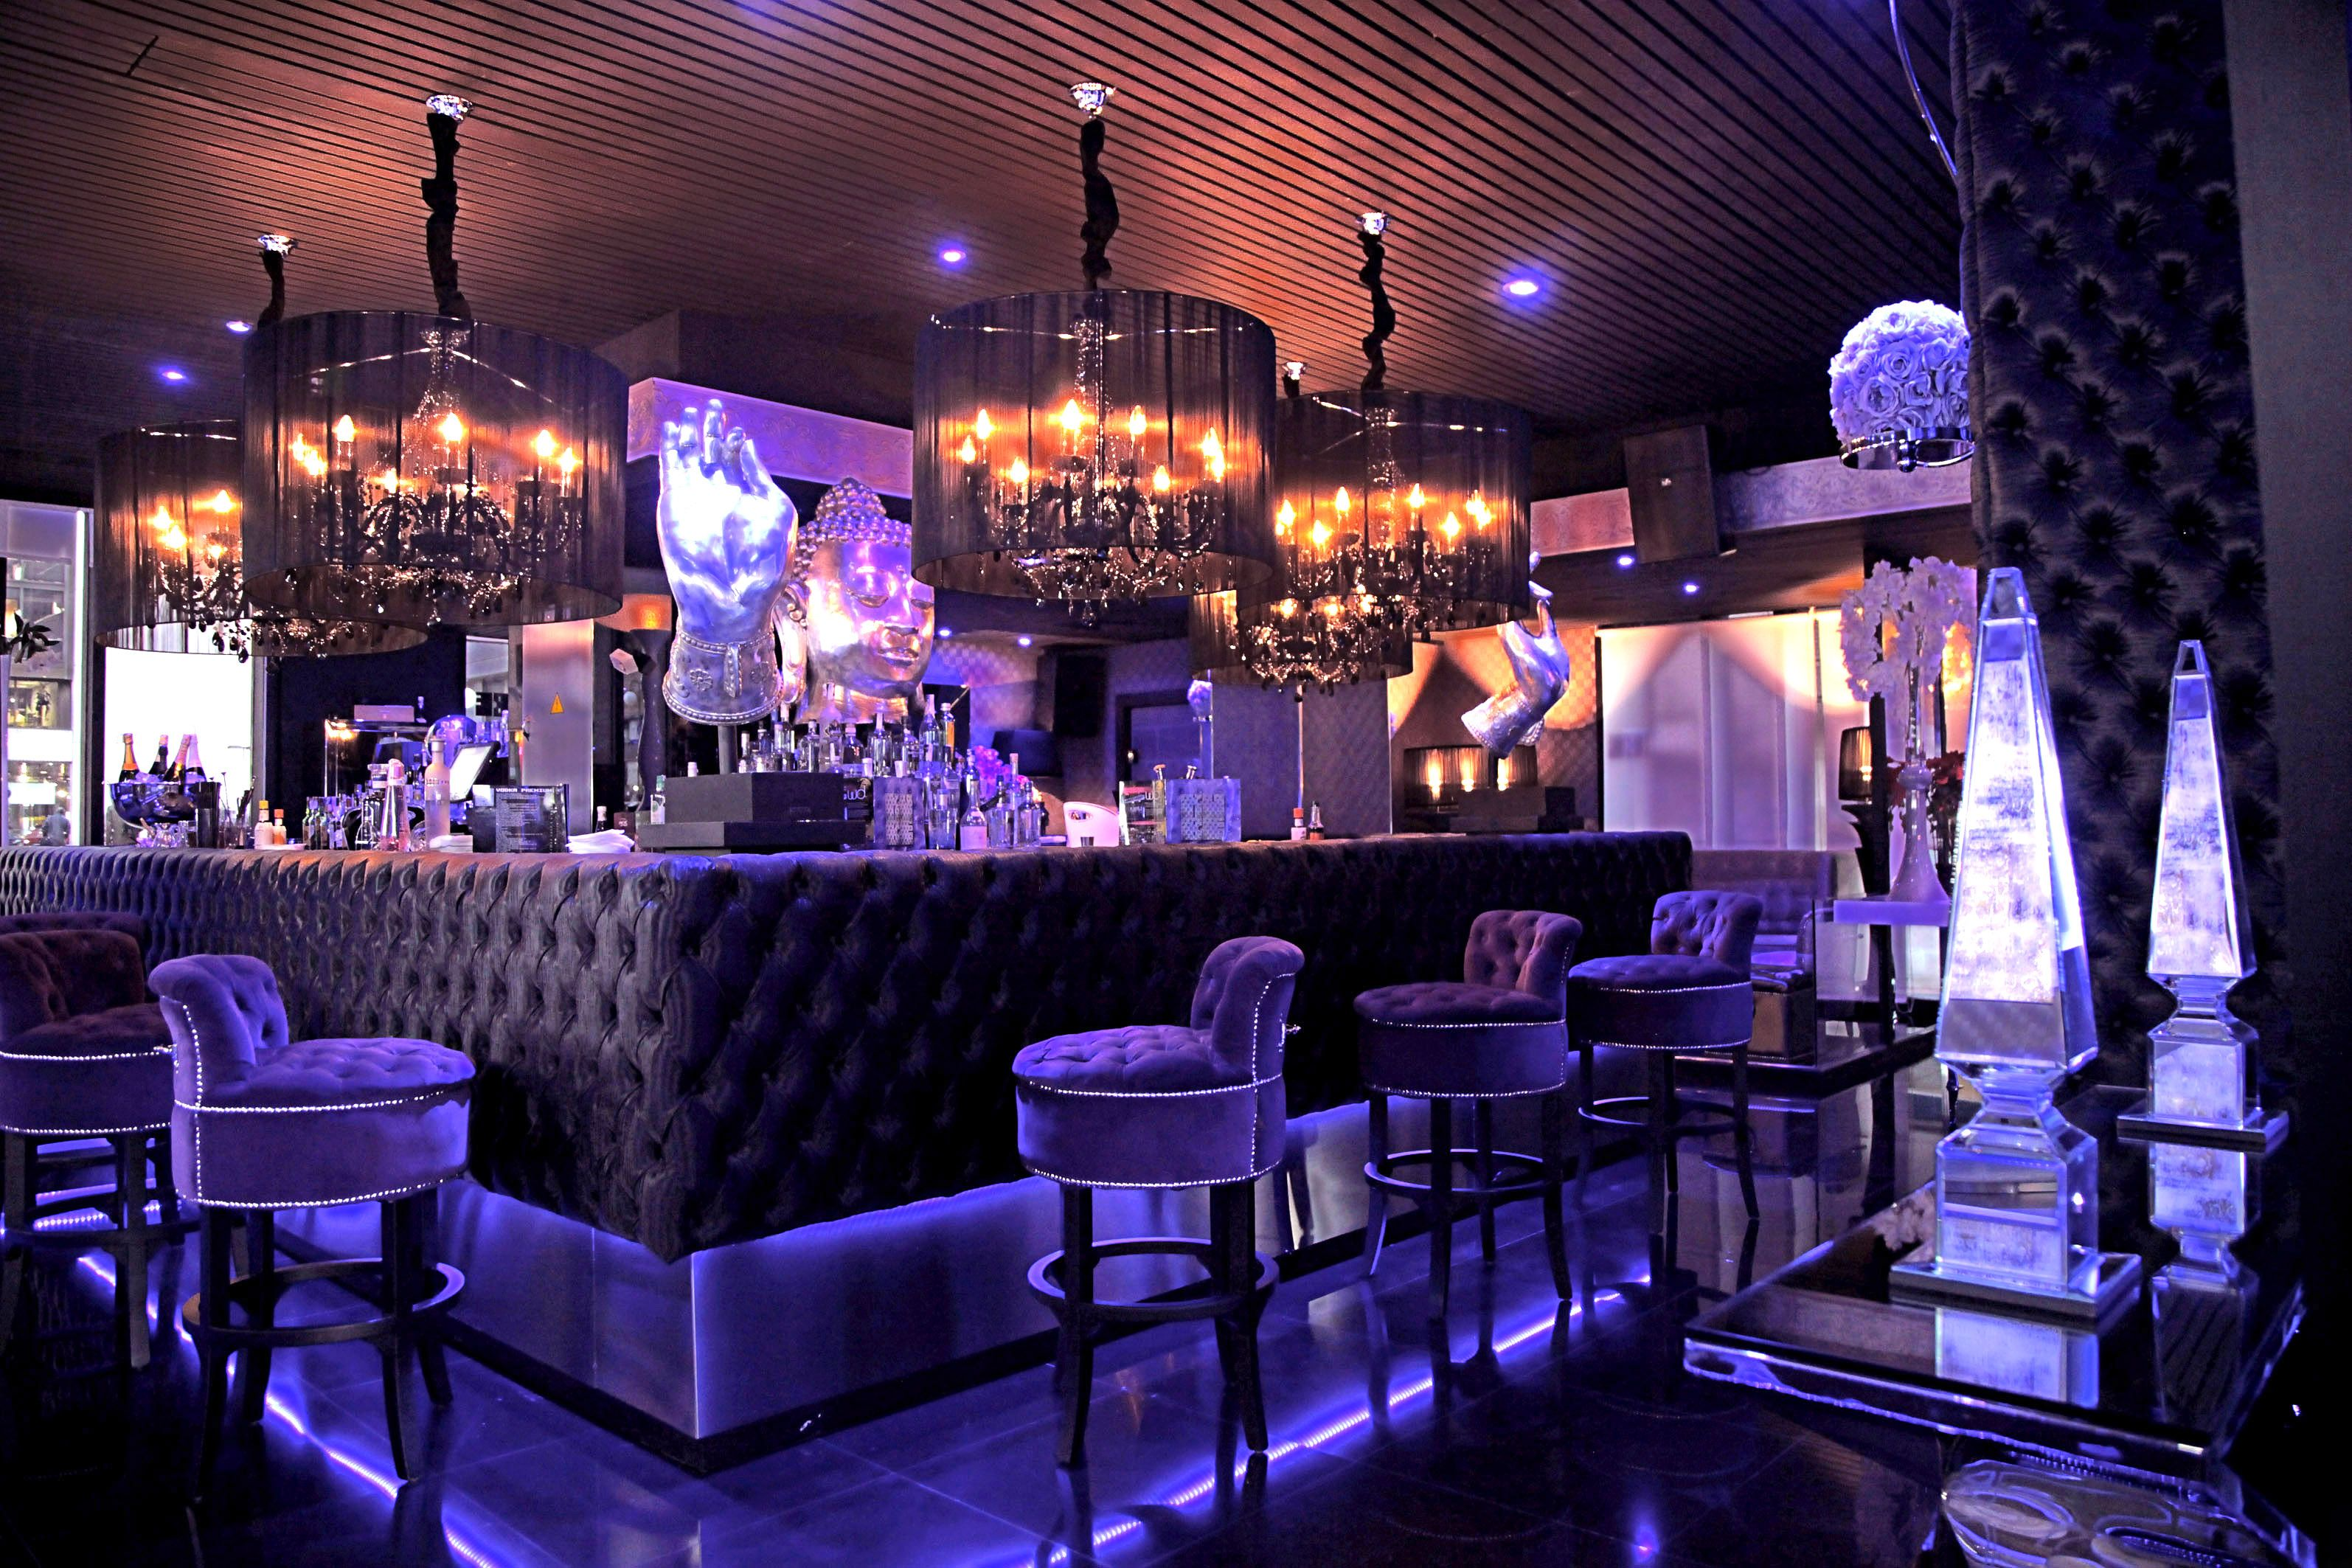 Newwd decoracion de bares tematicos kube madrid decoracion moderna lugares para visitar - Decoracion bares tematicos ...